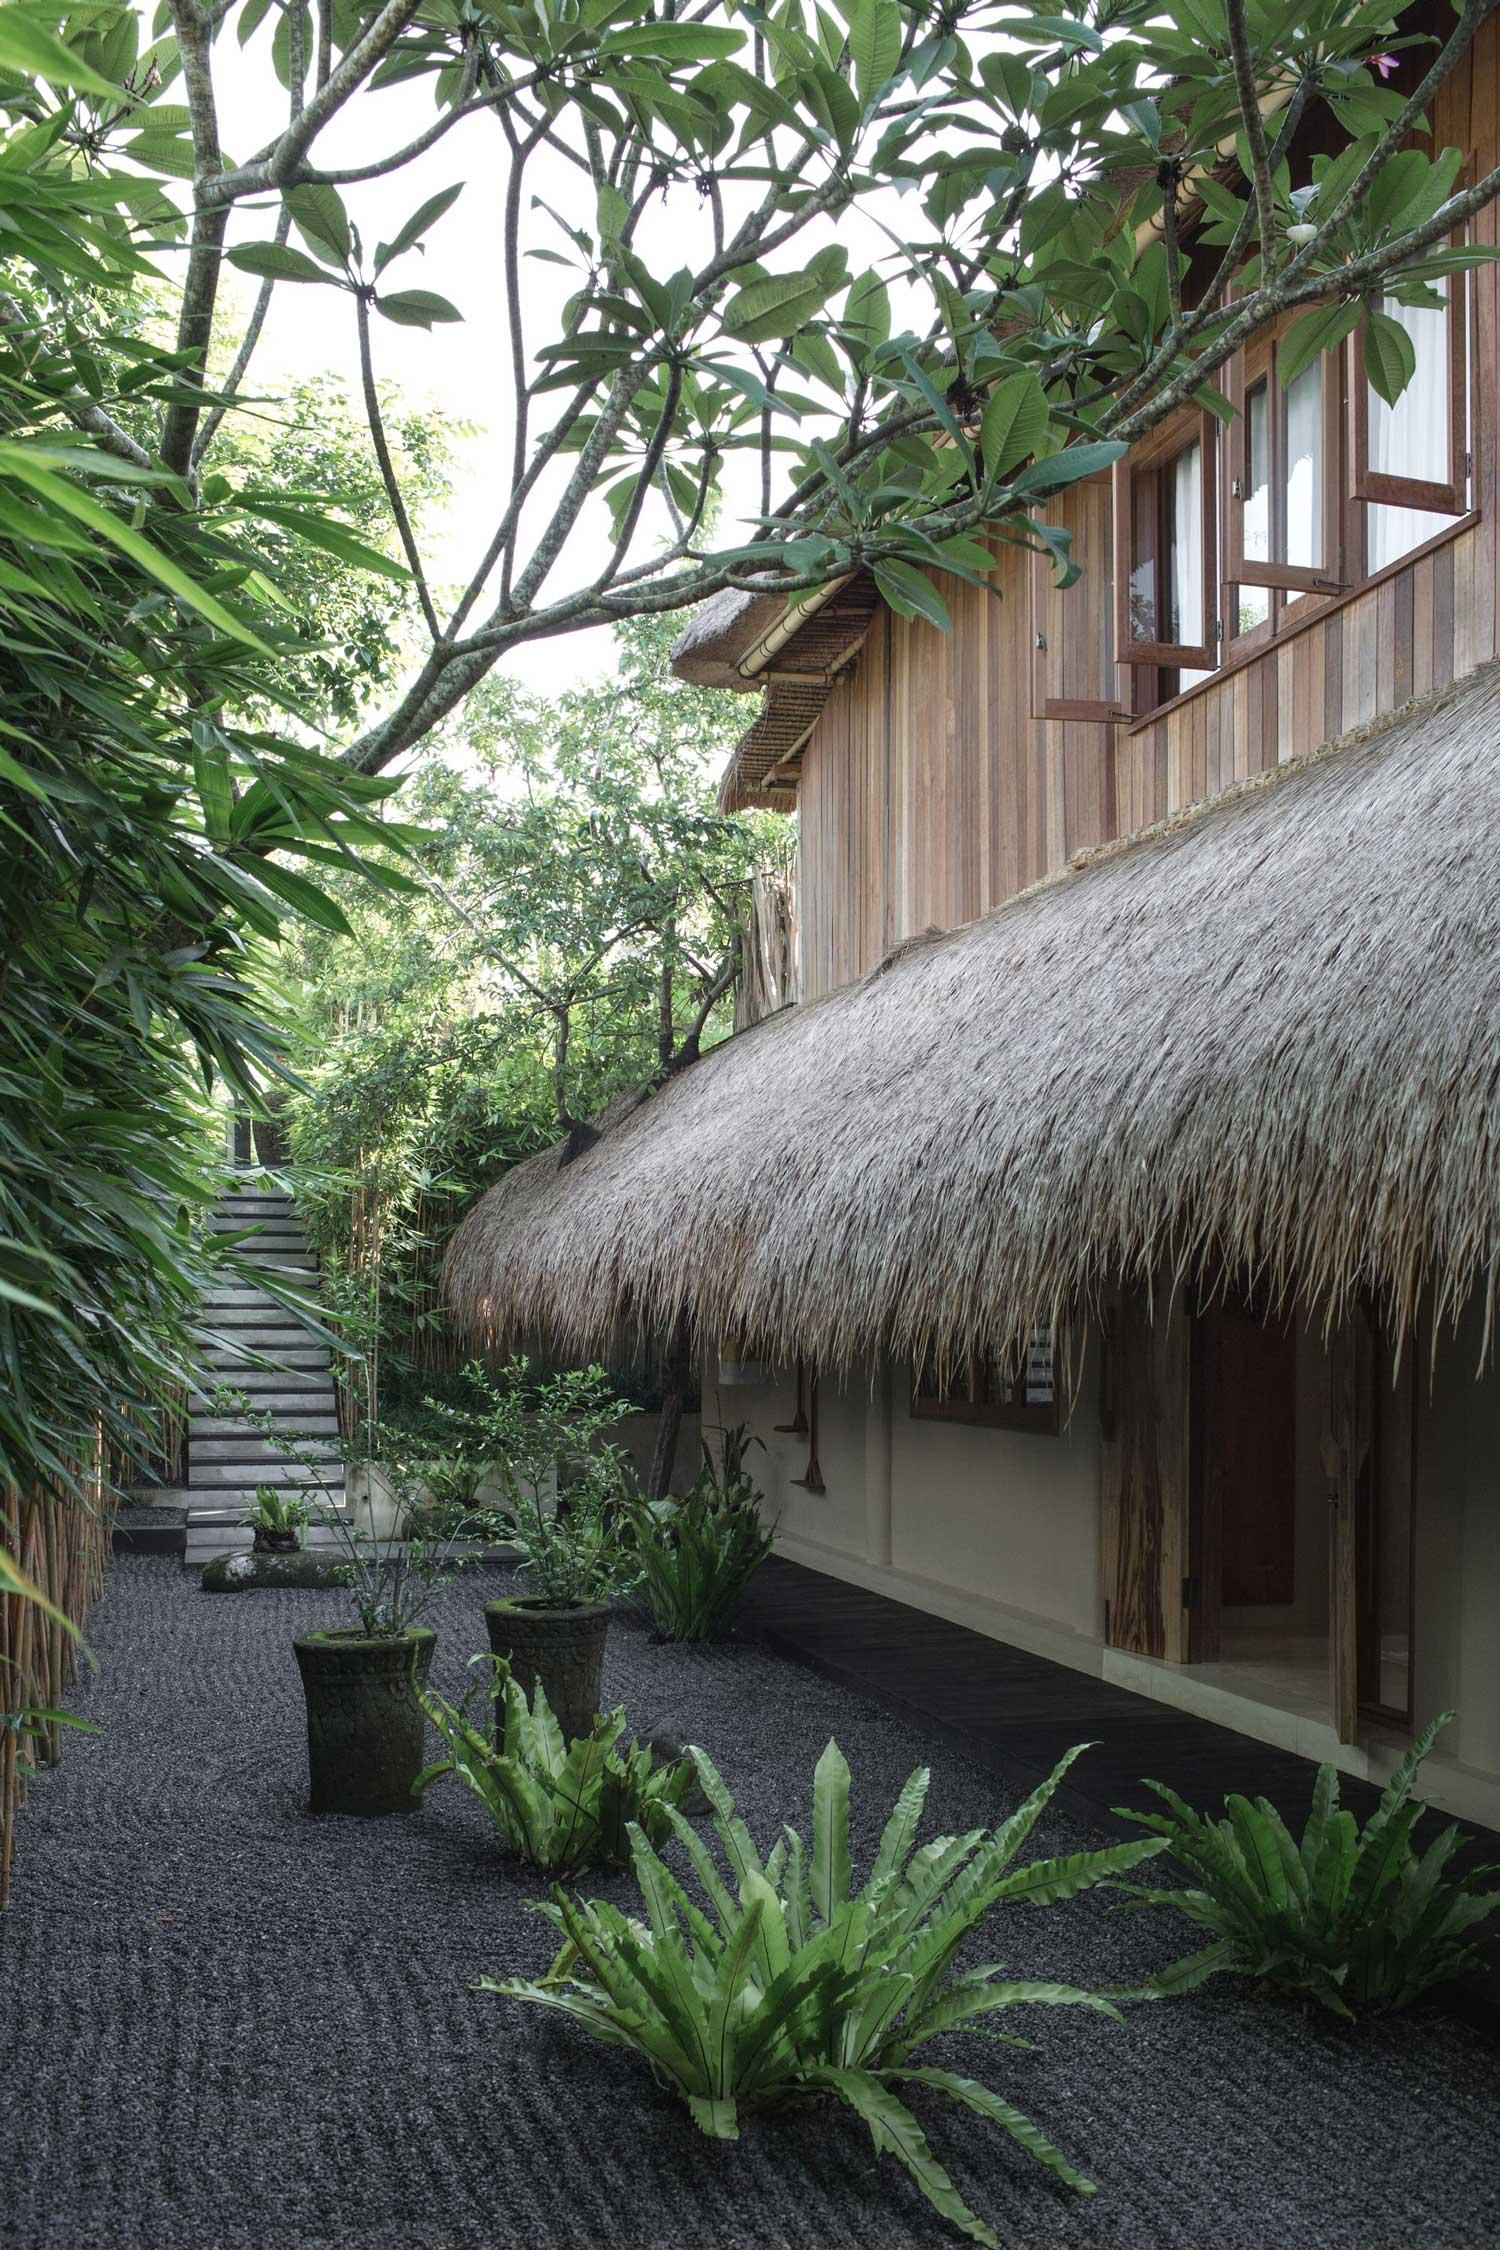 Rumah Purnama Villa in Ubud, Bali by Studio Jencquel.